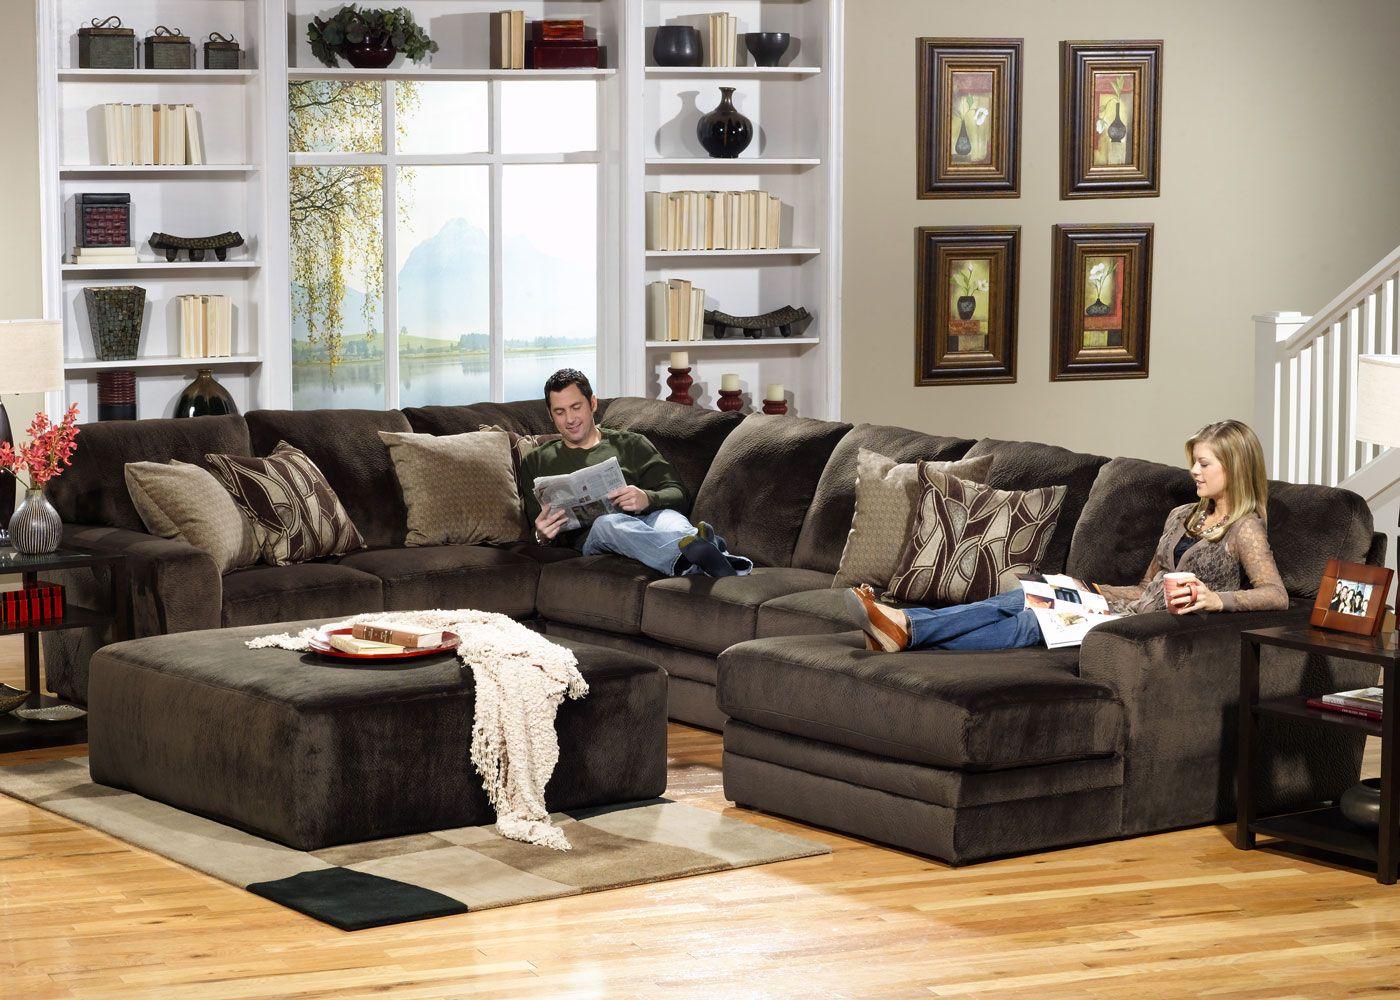 Everest 3pc Plush Sectional Sofa Set